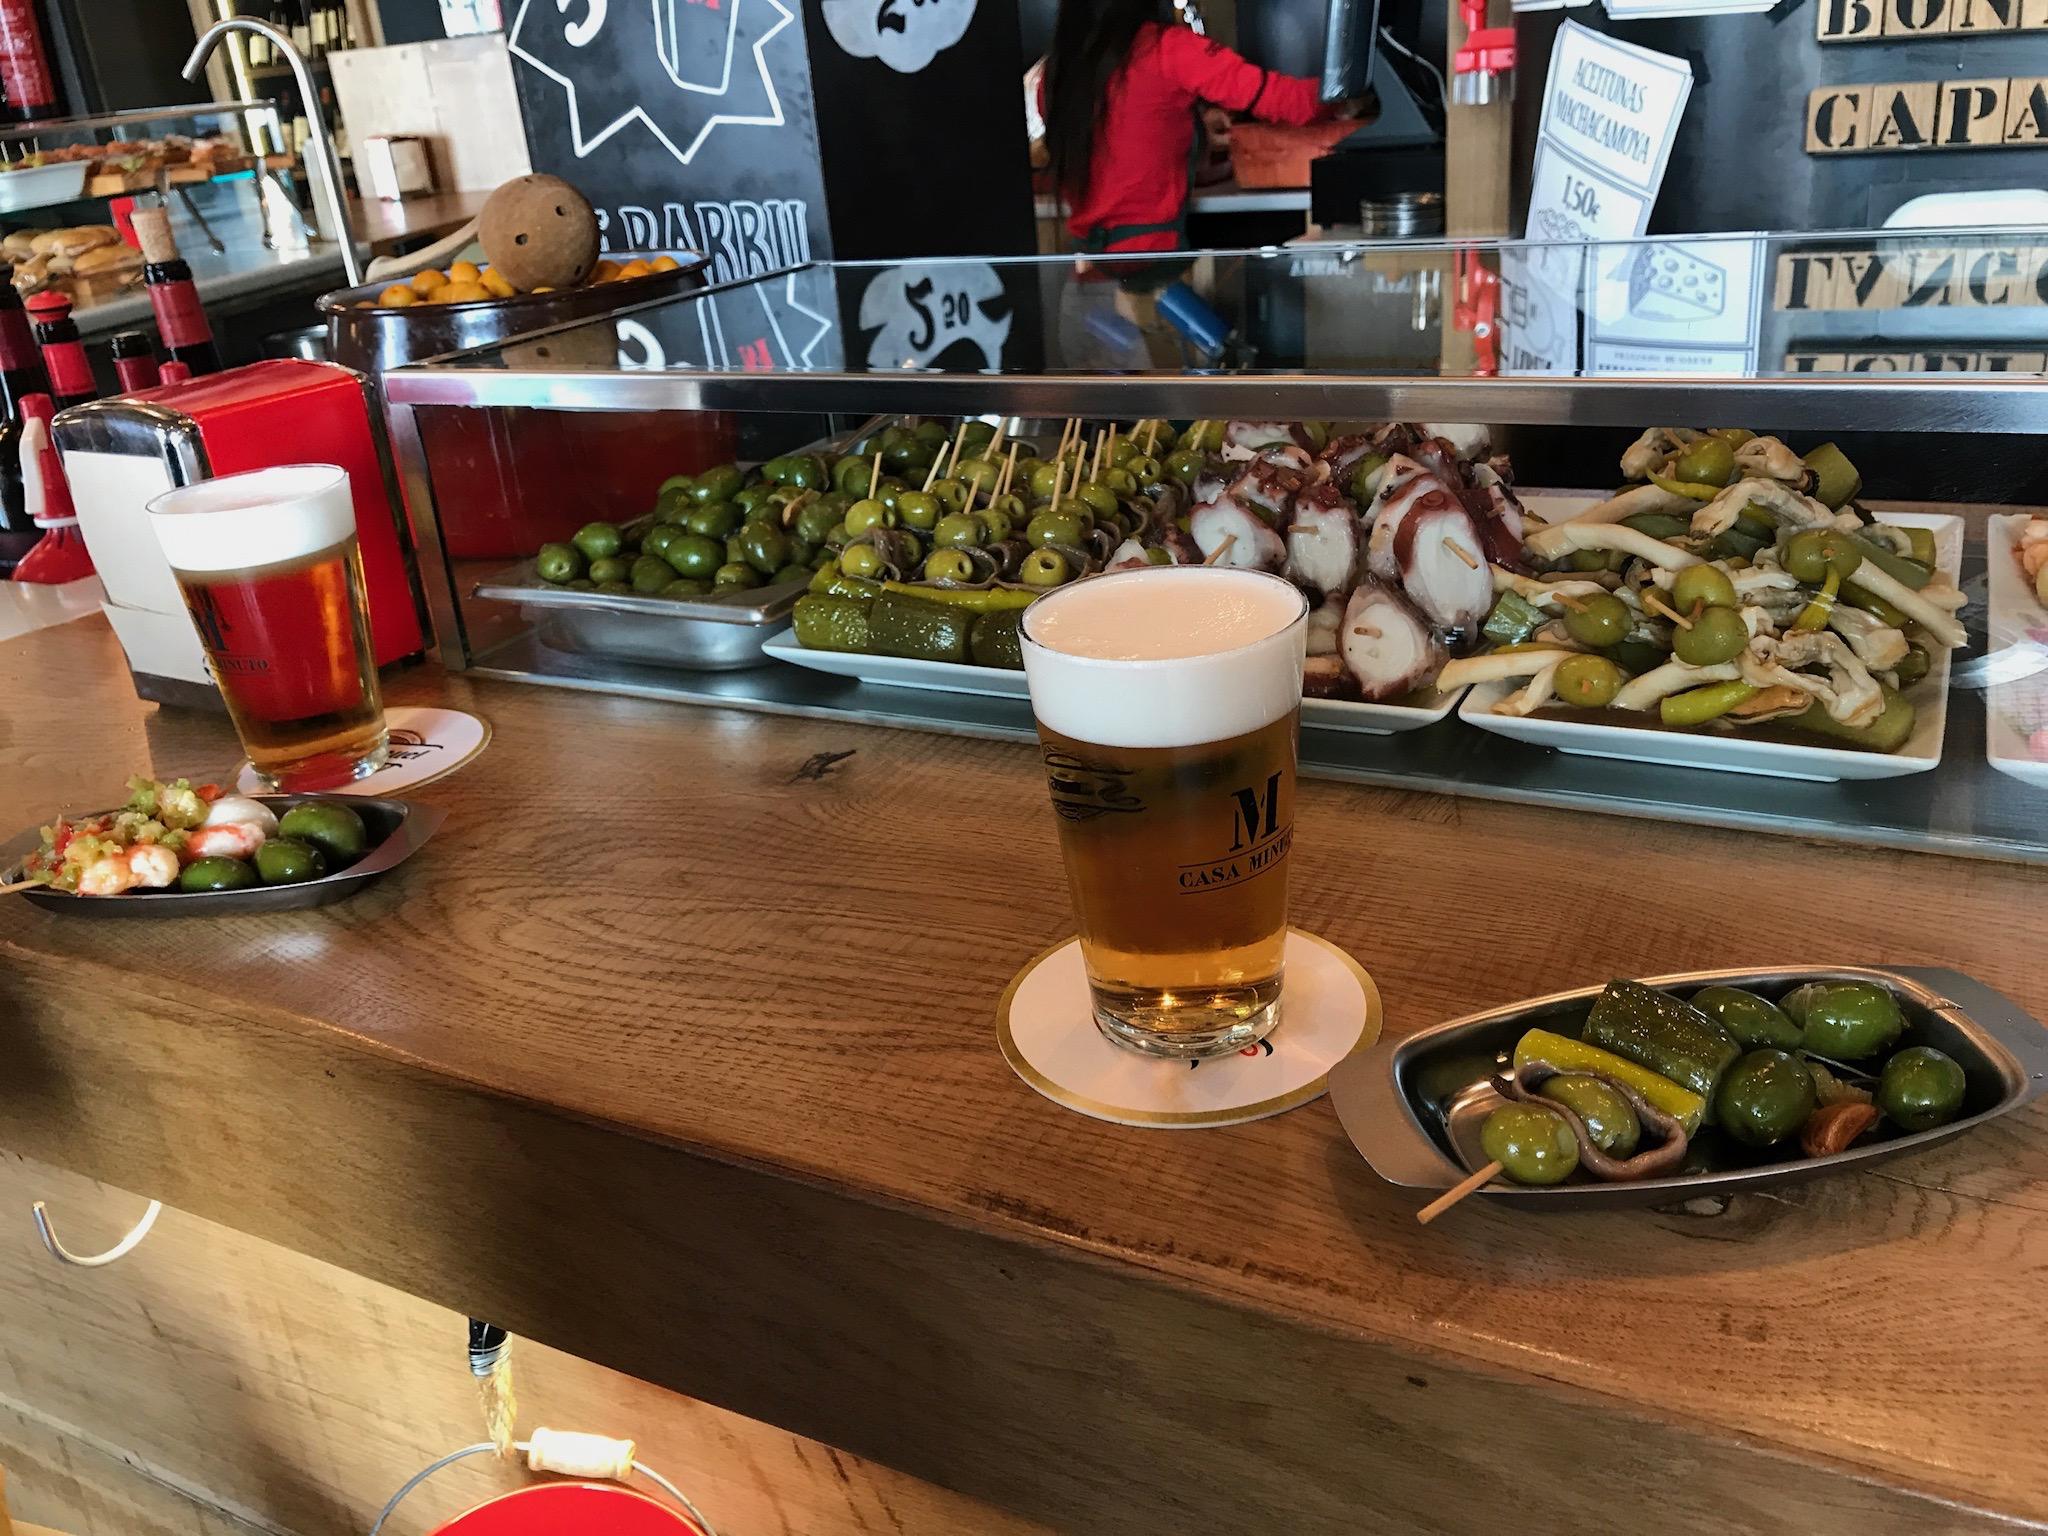 Delightful tapas in Burgos